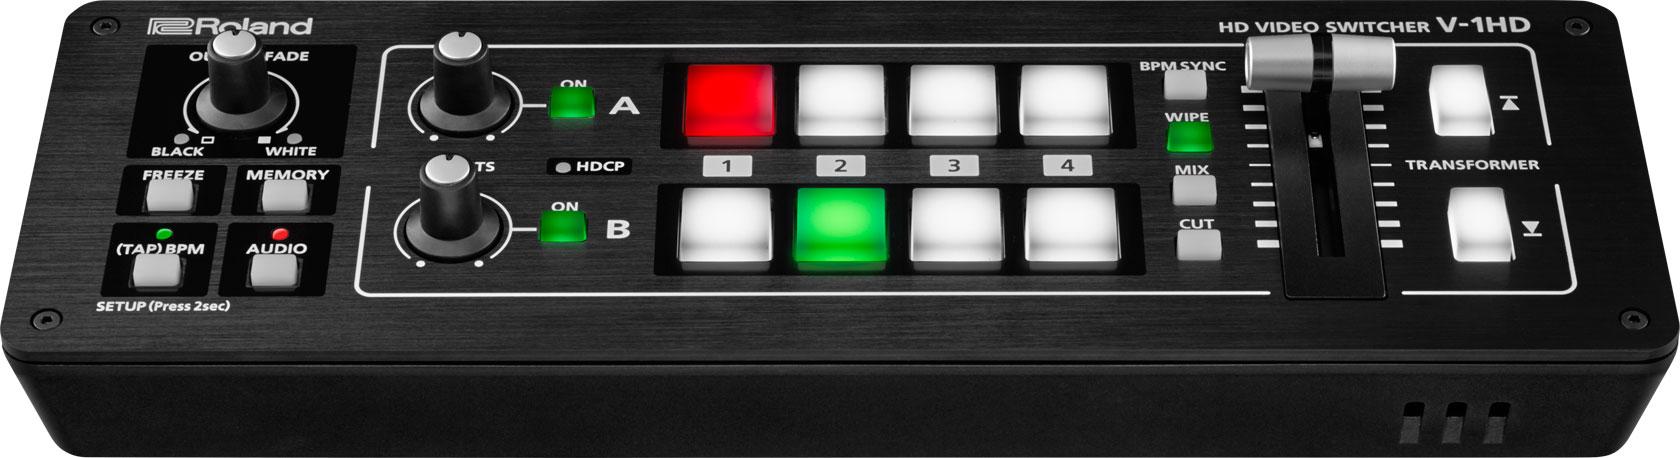 Compact 4 HDMI Input 1080p Video/Audio Switcher/Mixer